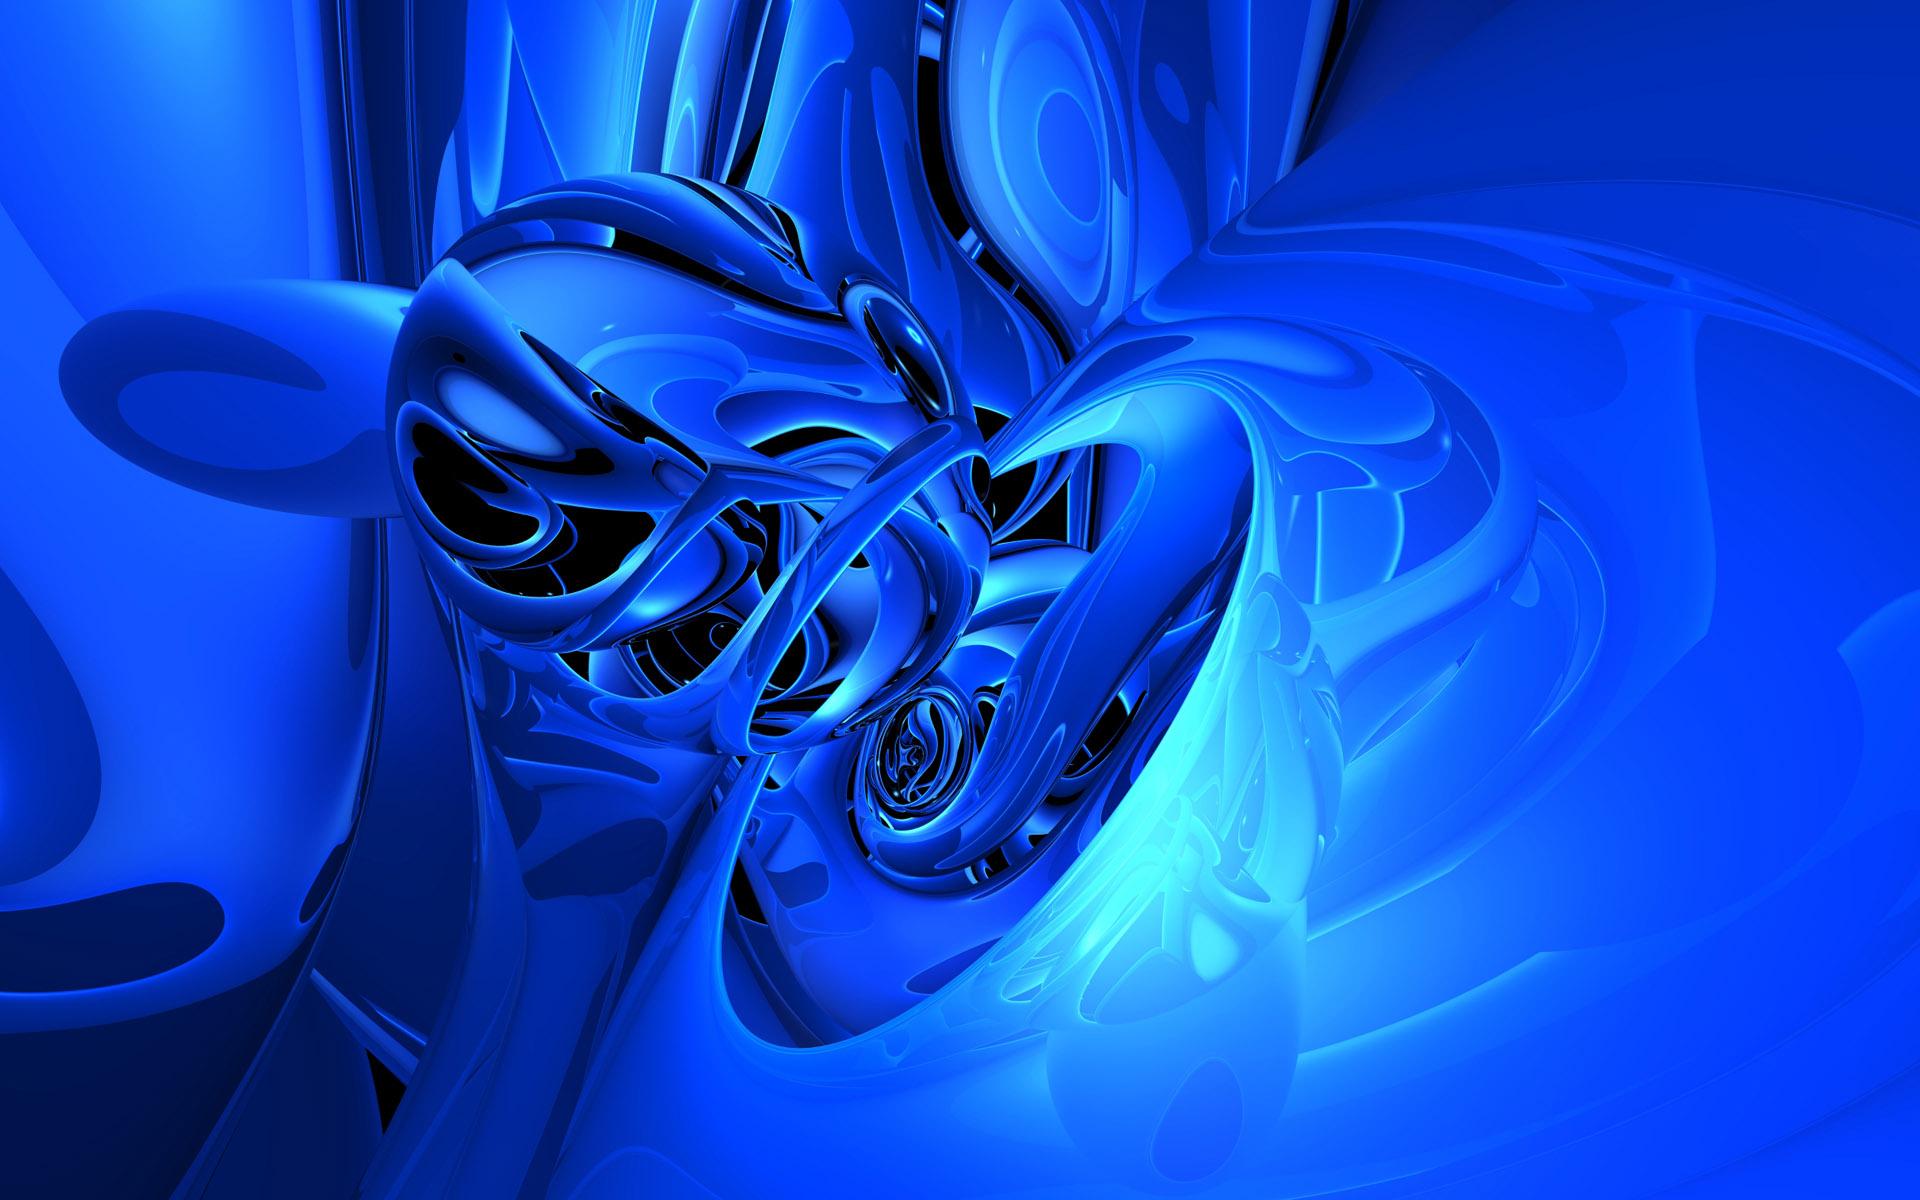 wallpaper abstract blue walls 1920x1200 1920x1200